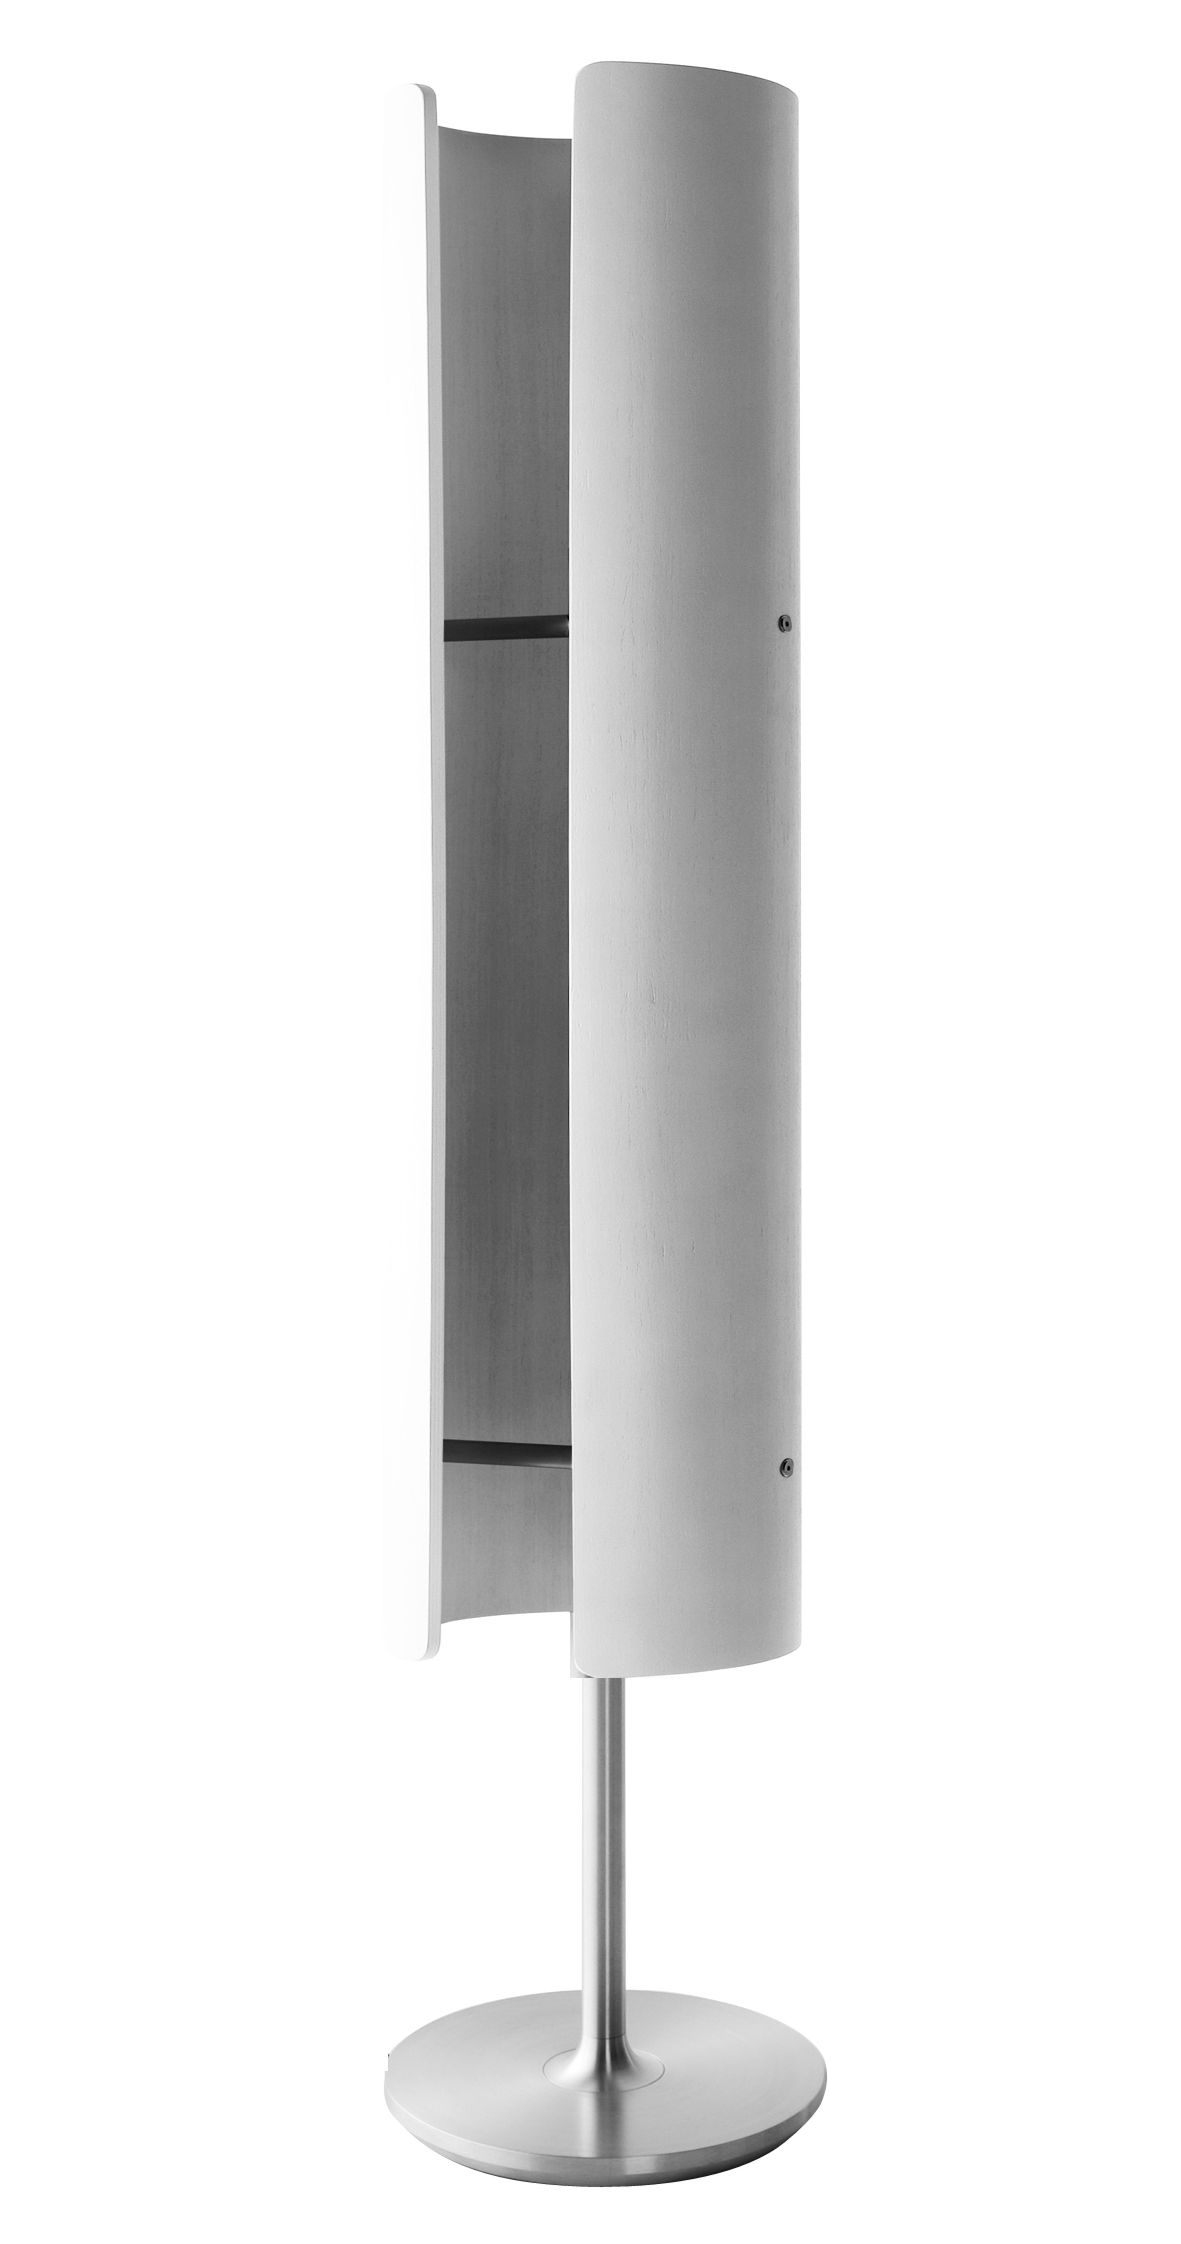 radiateur totem infrarouge et mobile h 122 cm ch ne teint blanc i radium. Black Bedroom Furniture Sets. Home Design Ideas